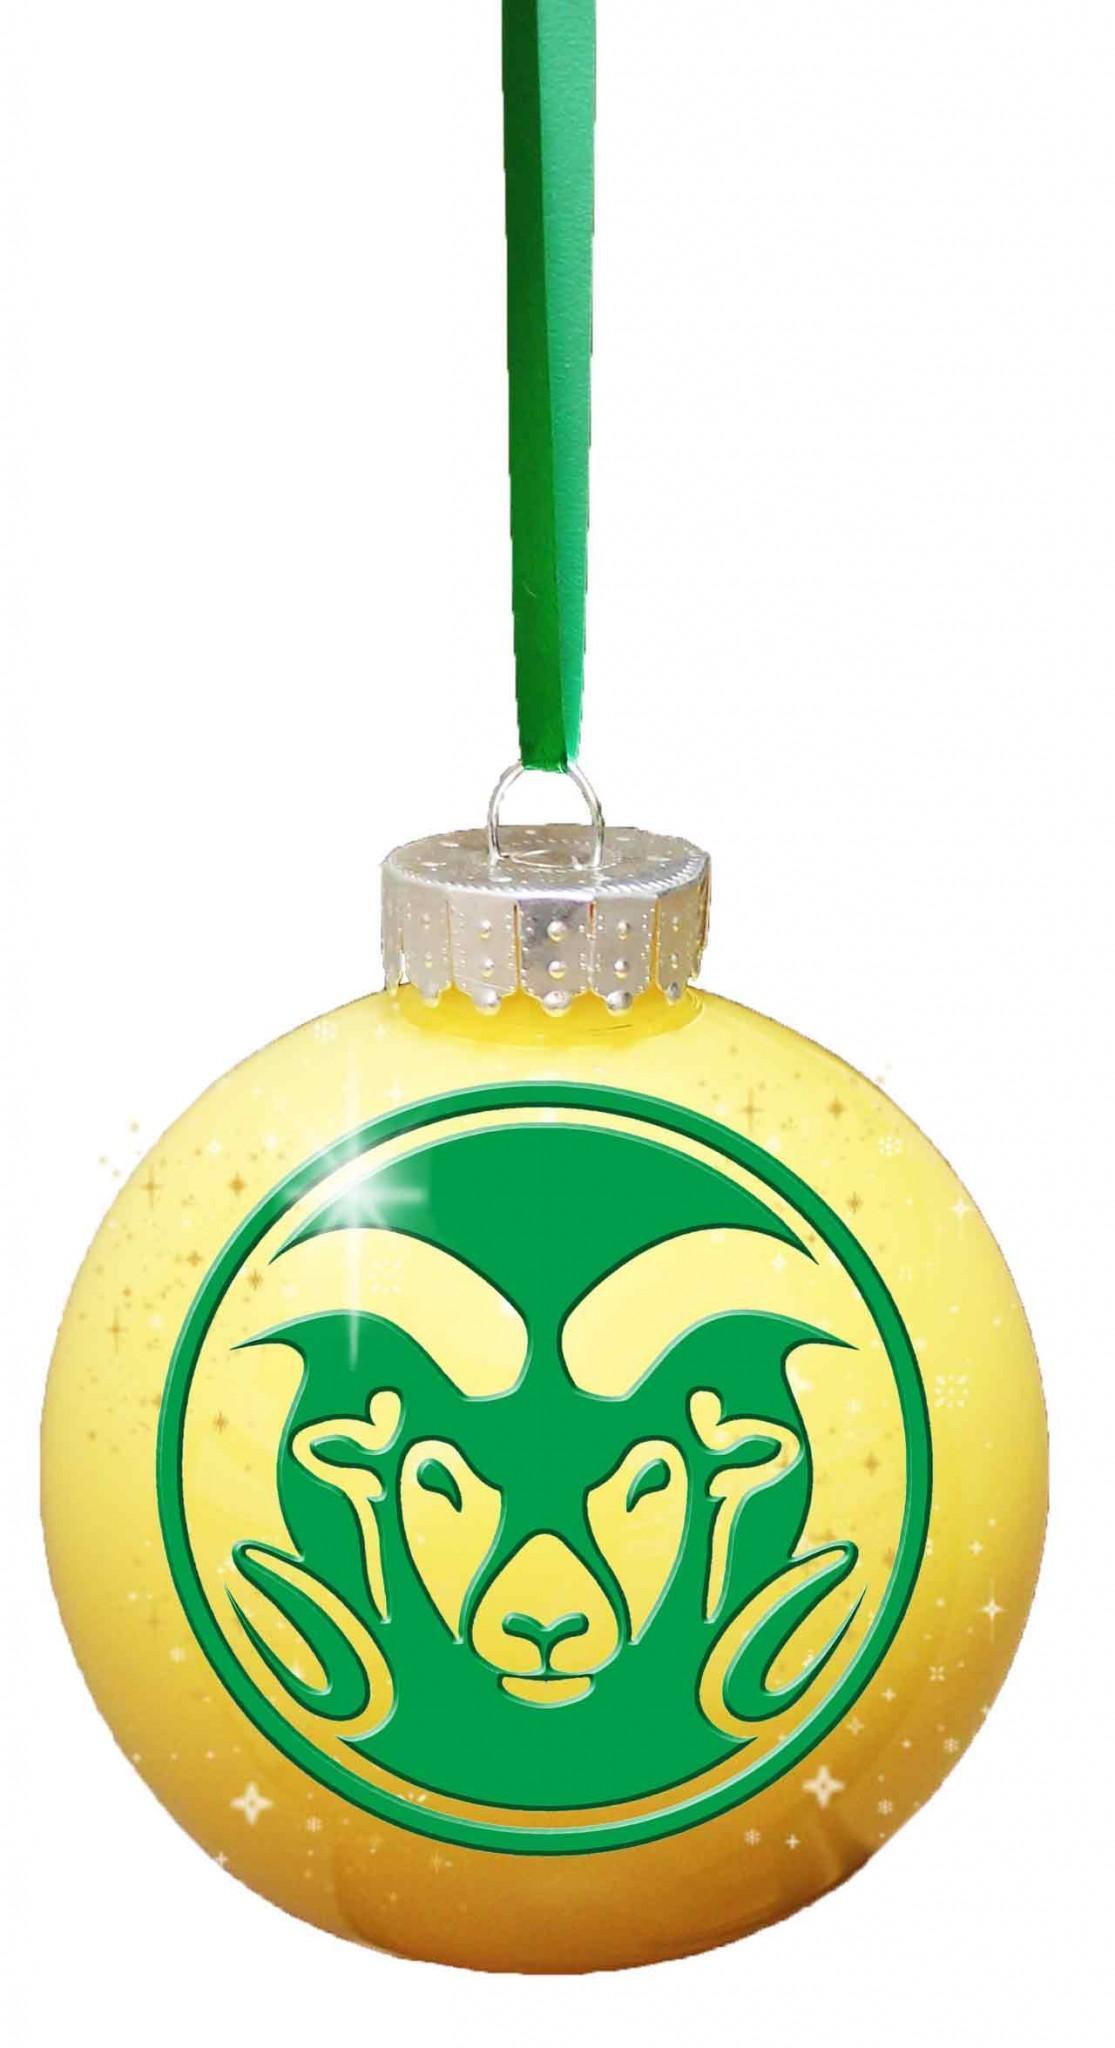 CSU logo imposed on a yellow ornament graphic Illustration by Ricki Watkins.